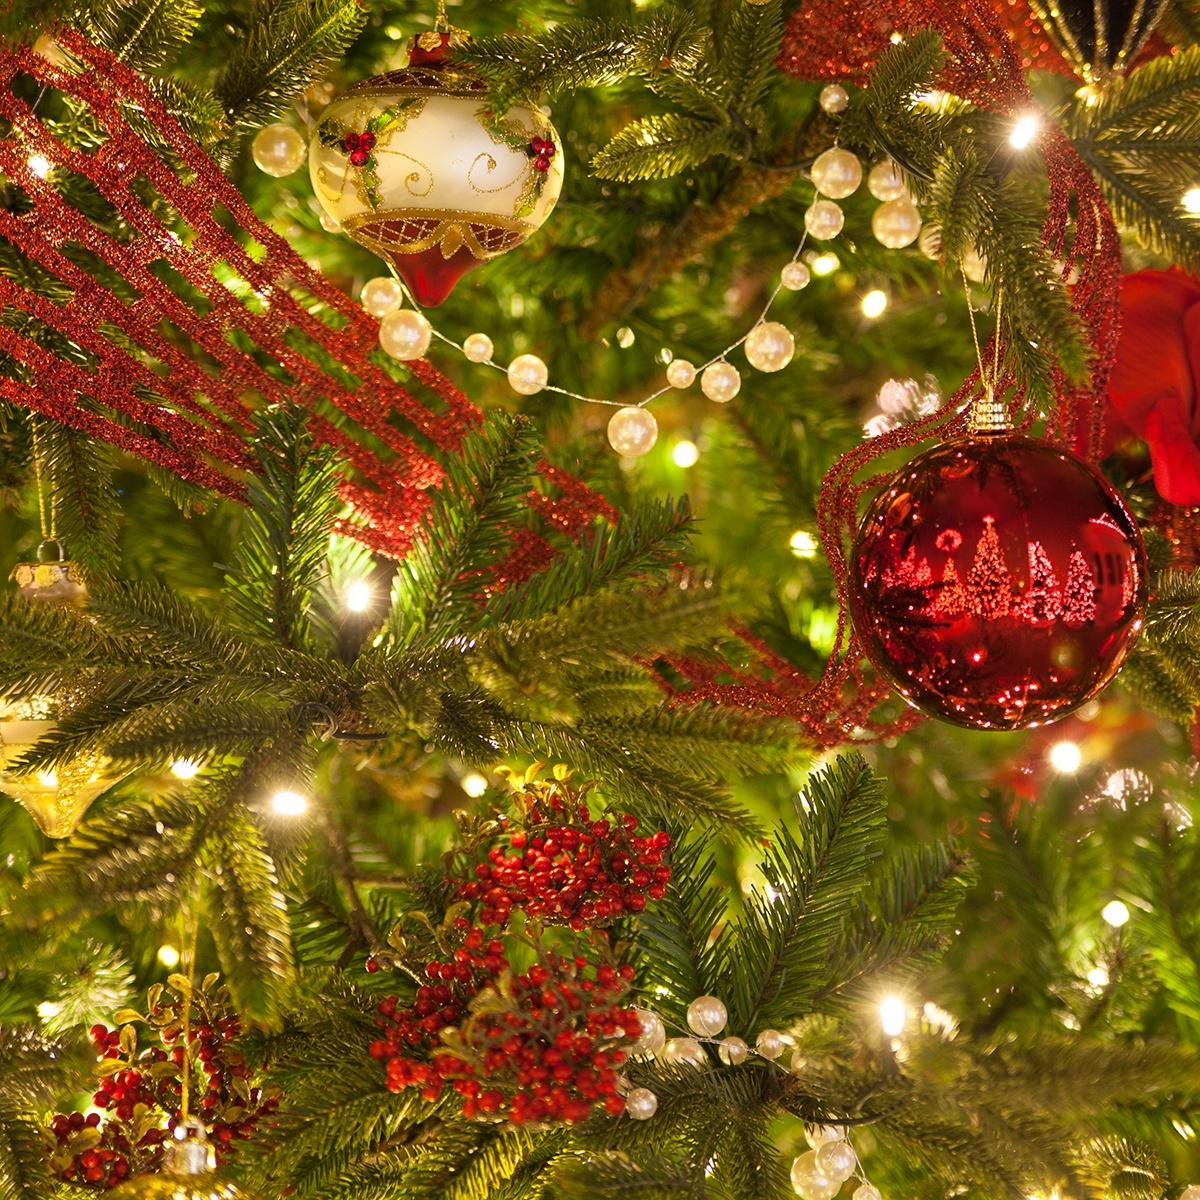 Prelit Christmas Tree Guide